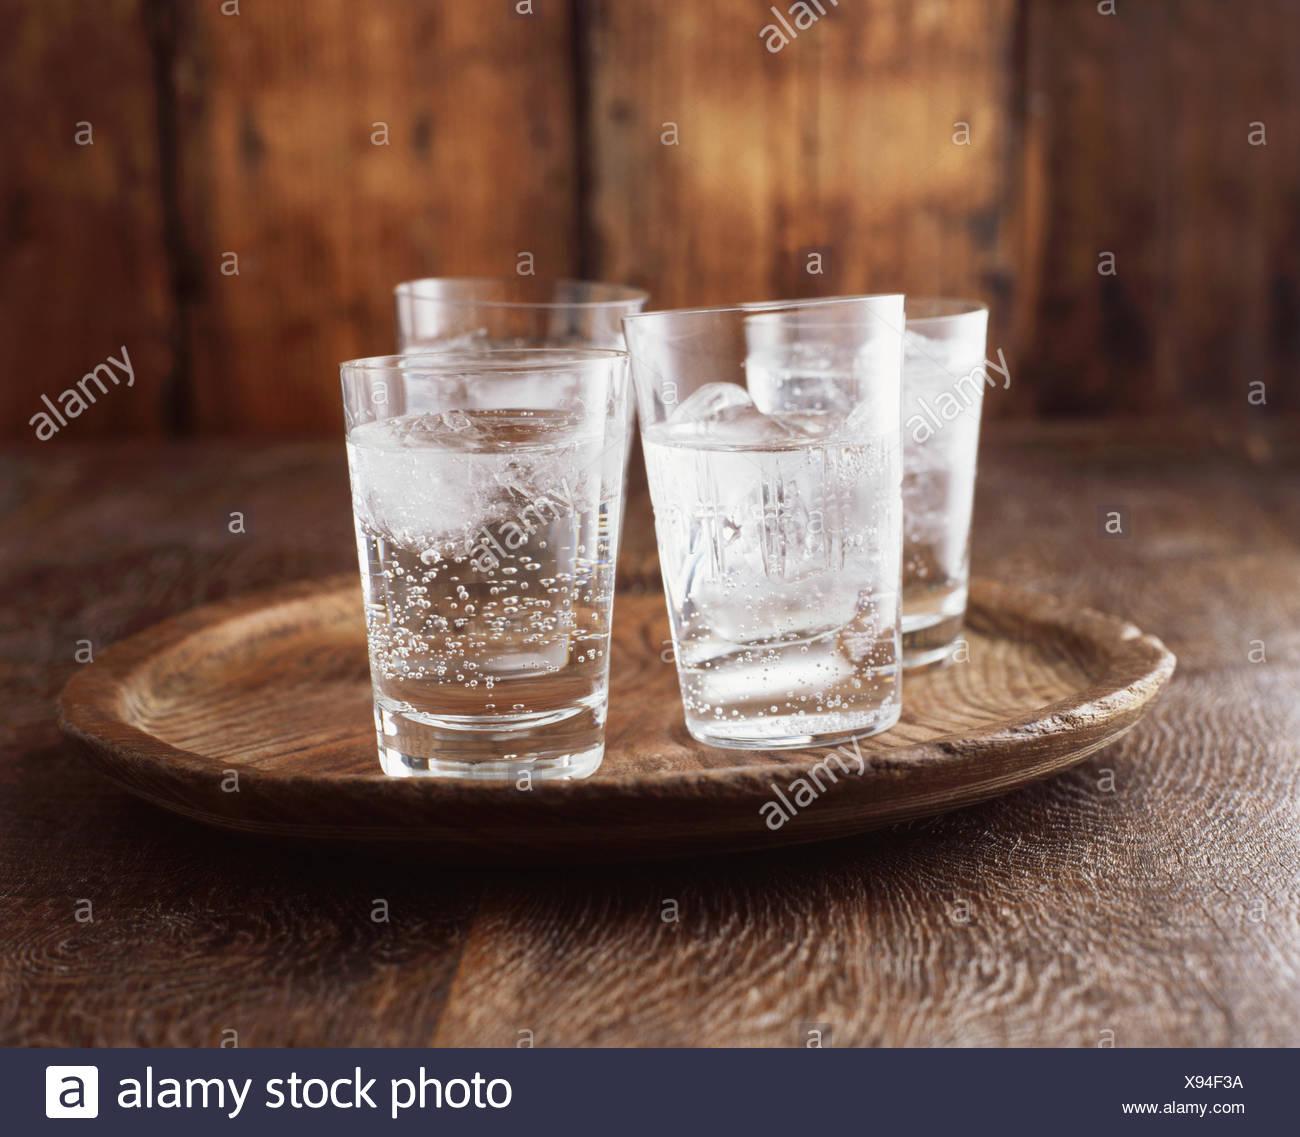 Plate Glass Stockfotos & Plate Glass Bilder - Seite 10 - Alamy